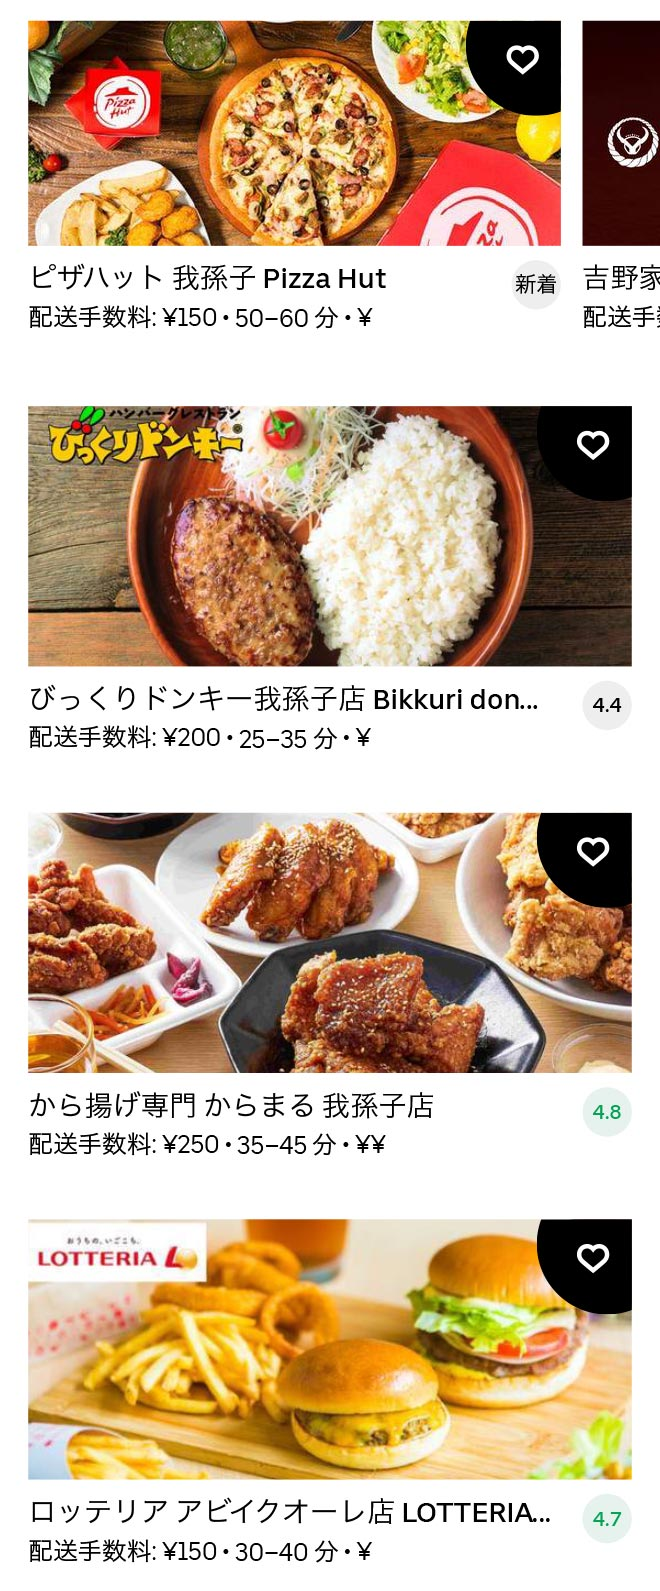 Abiko menu 2011 02